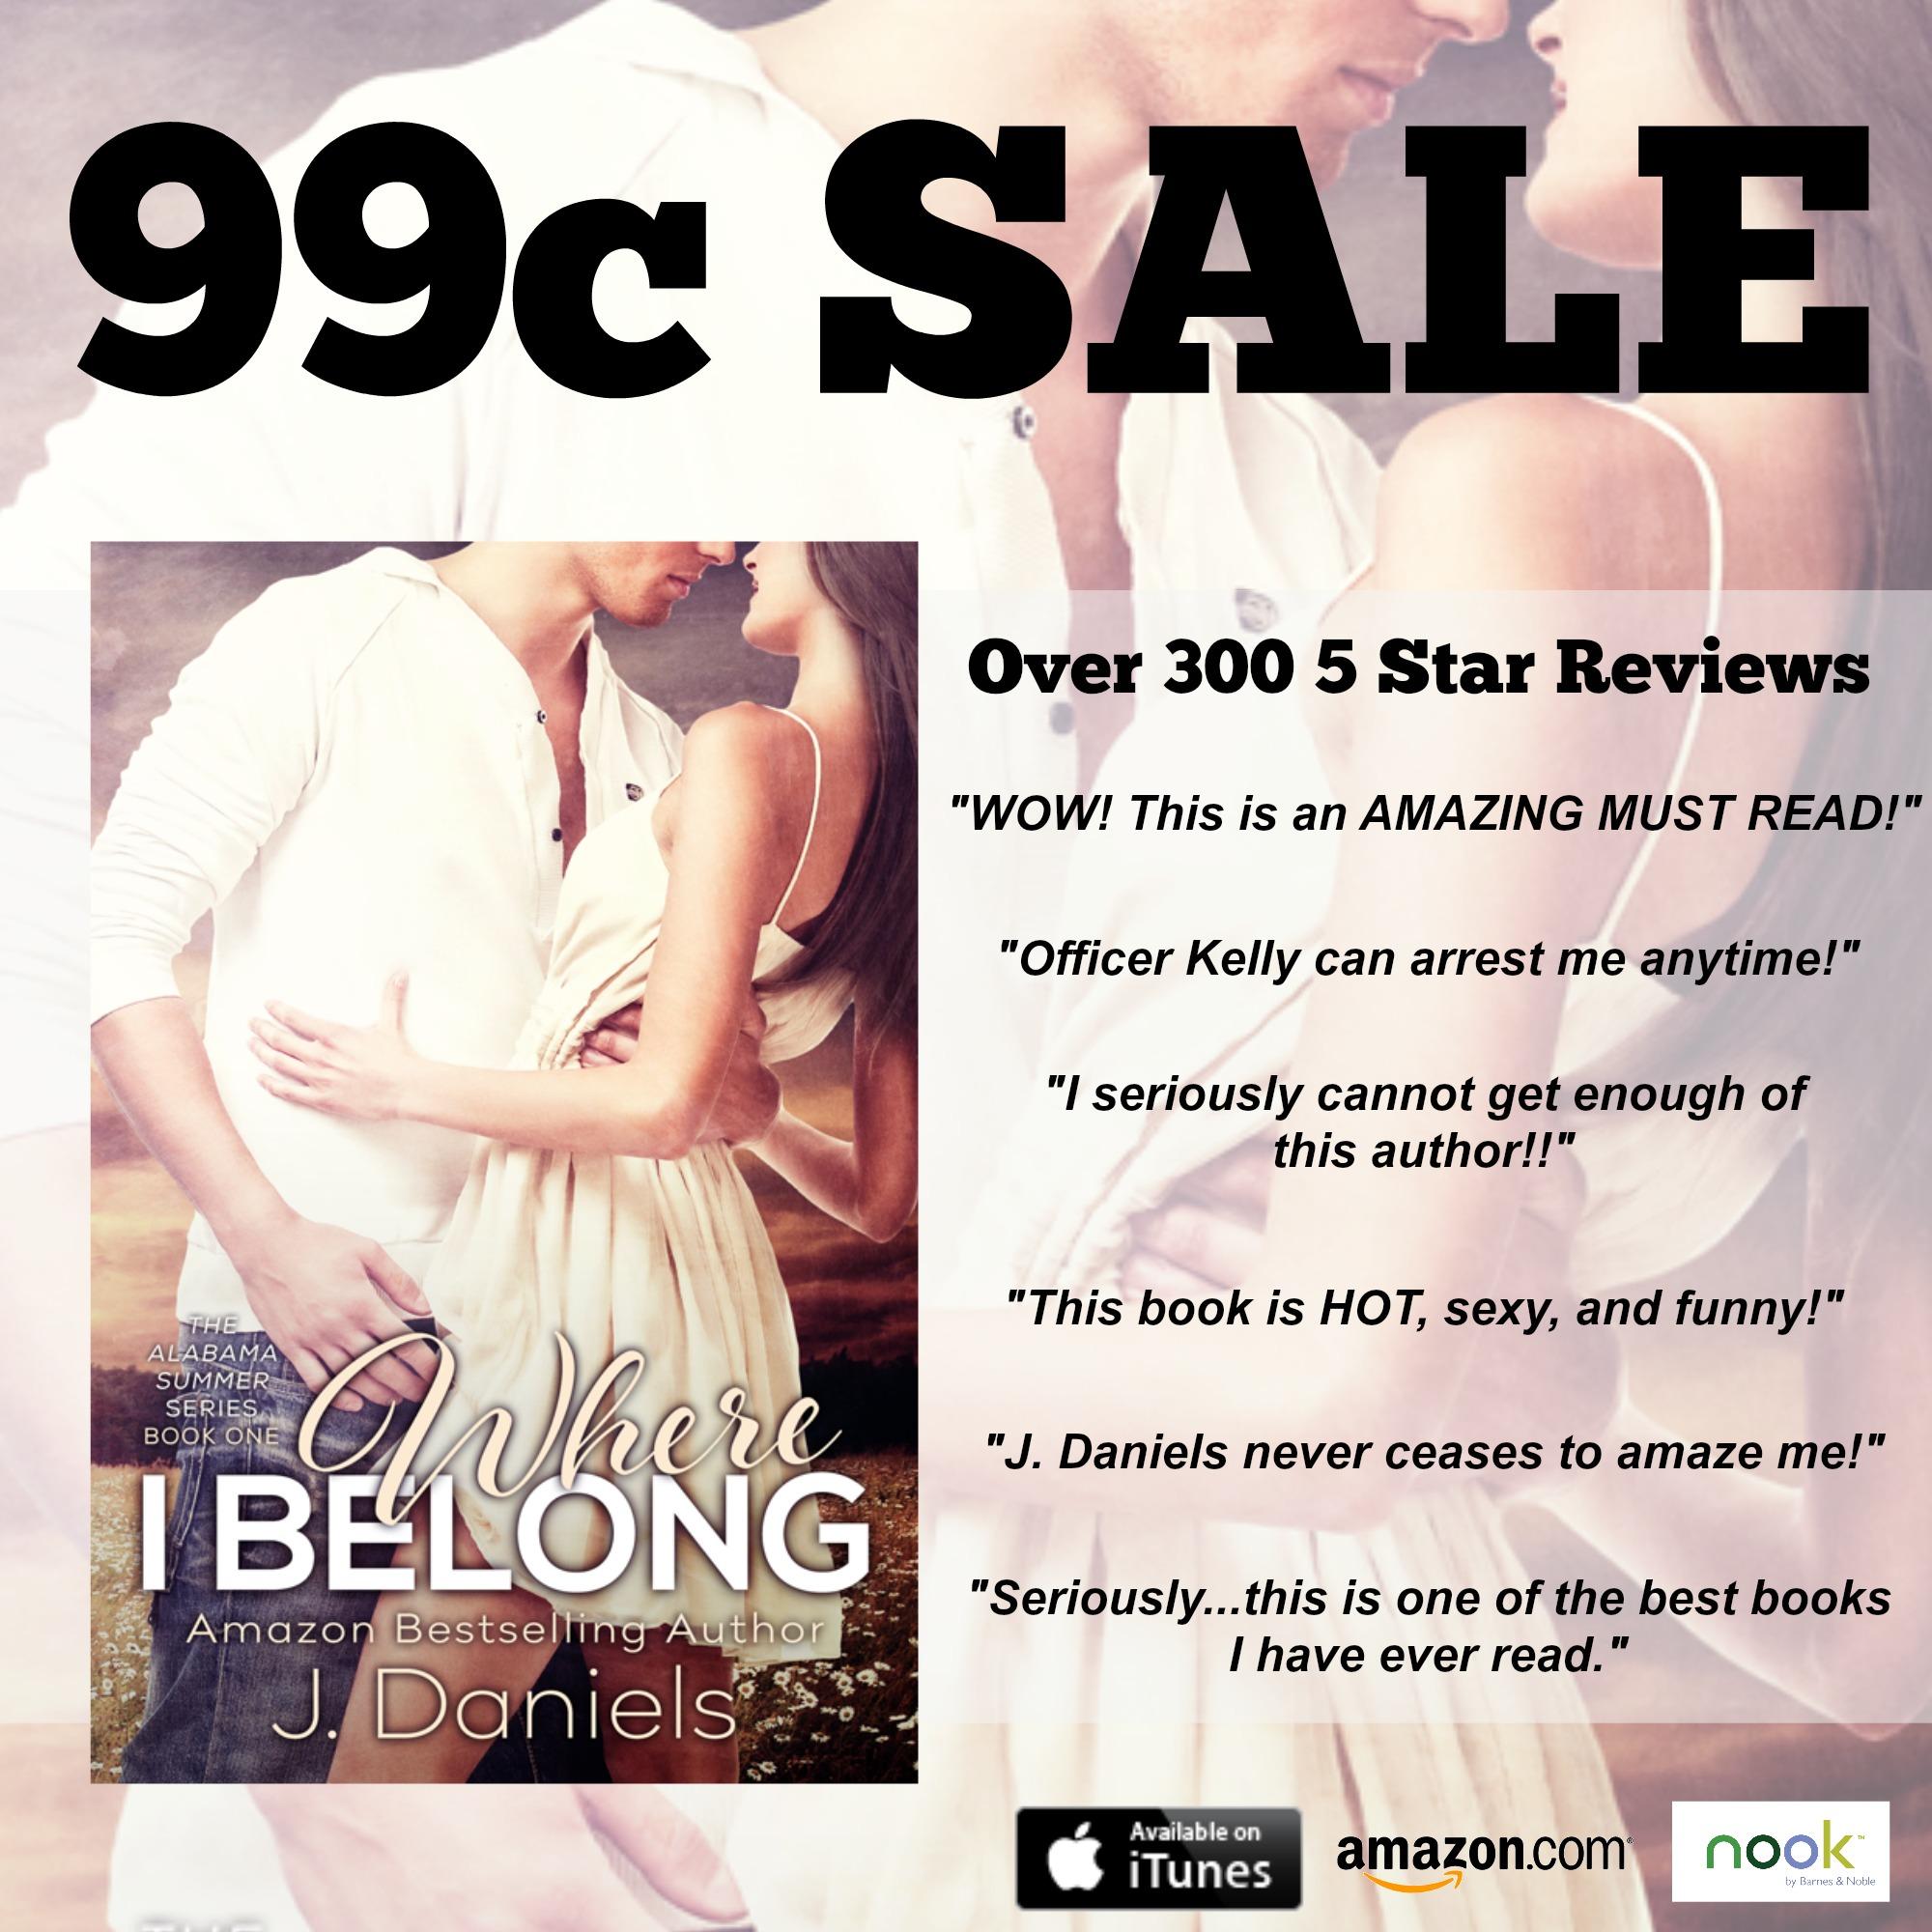 99c Sale Promo - Where I Belong